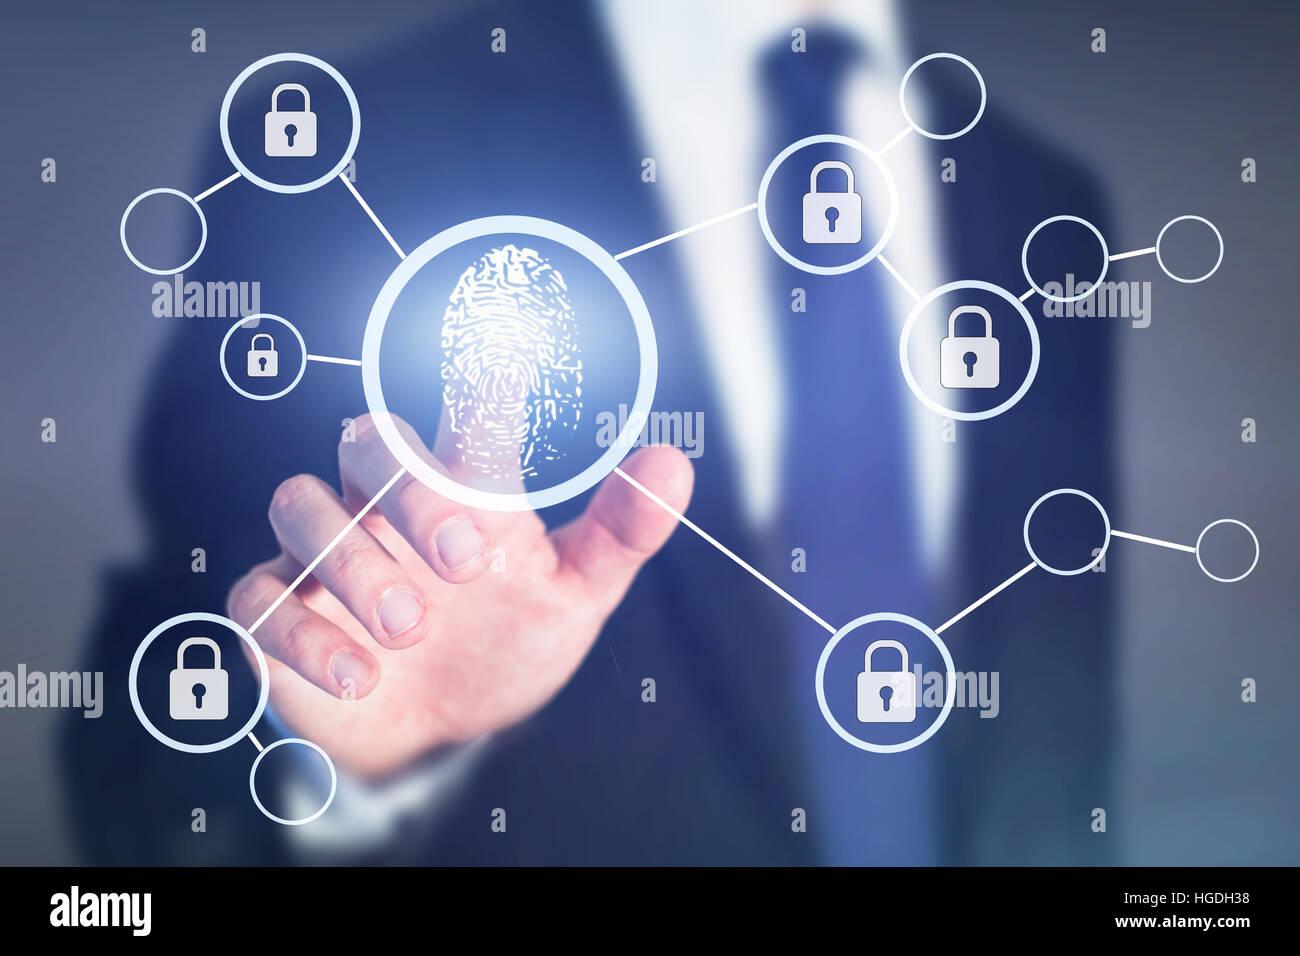 fingerprint authorization access concept, personal data information security - Stock Image